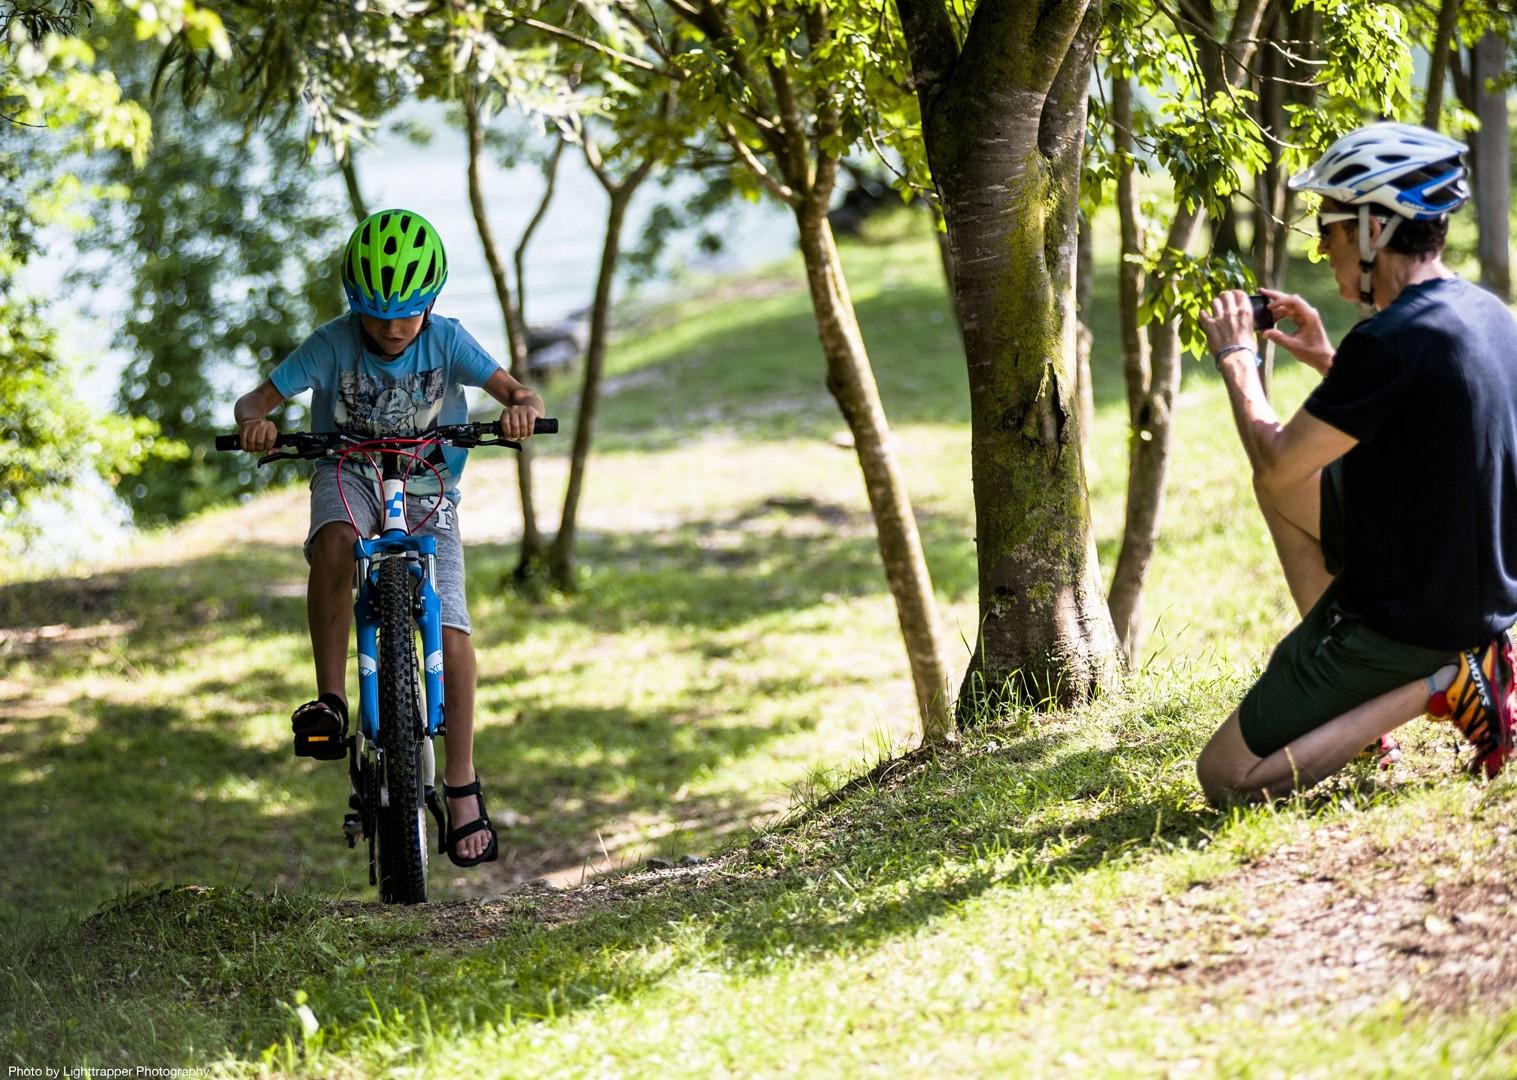 triglav-national-park-lake-bled-slovenia-family-cycling-holiday.jpg - Slovenia - Magical Lake Bled - Self-Guided Family Cycling Holiday - Family Cycling